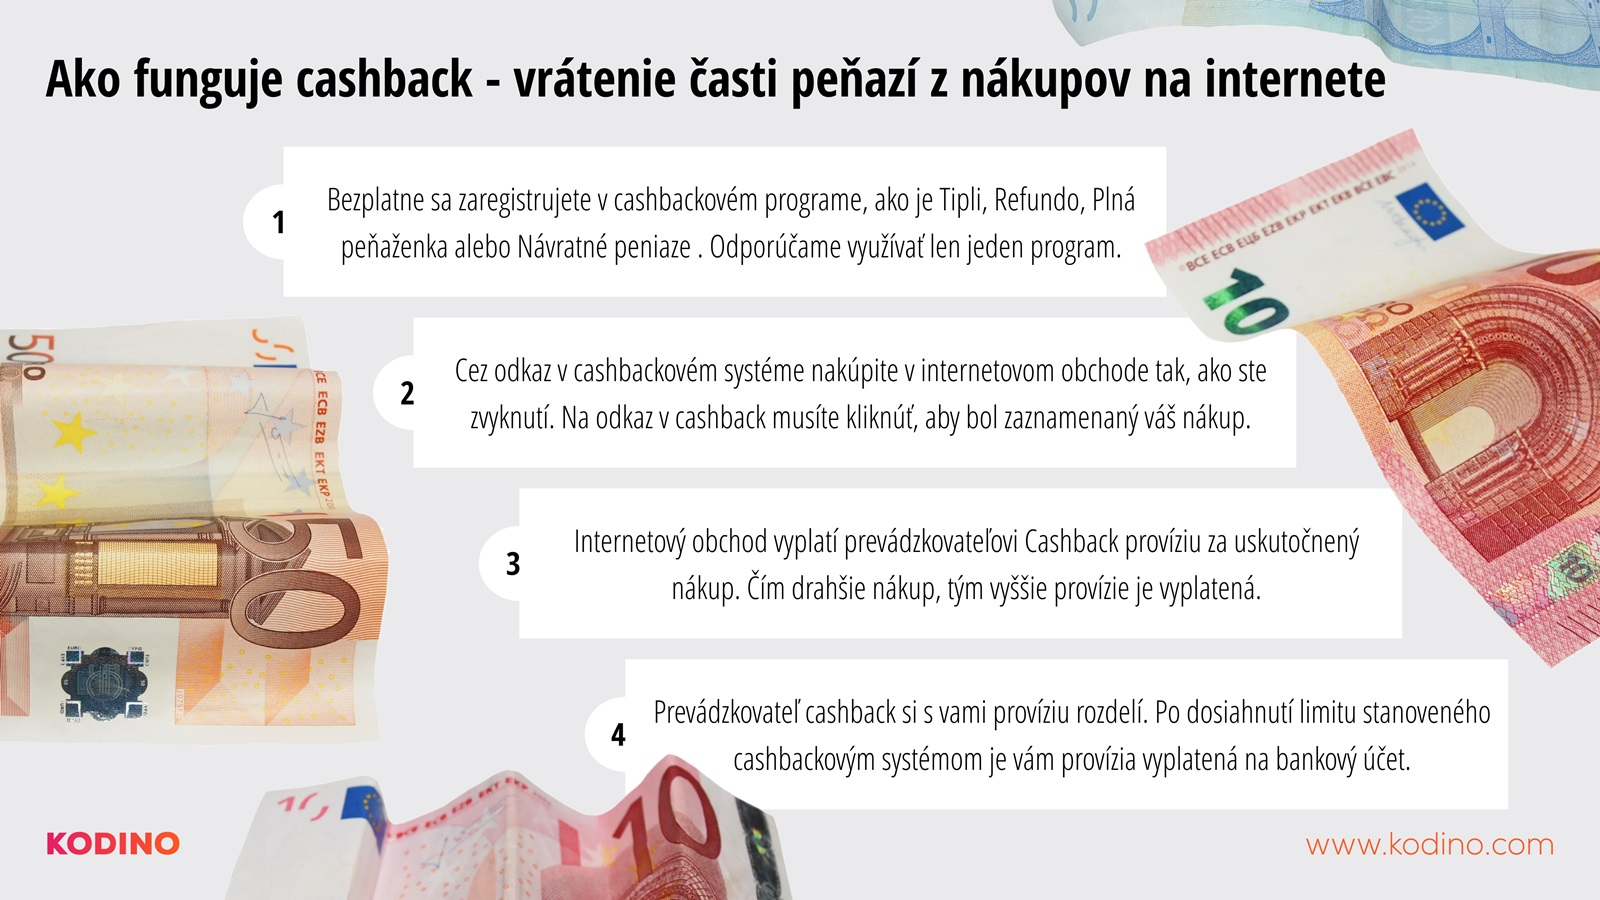 Ako funguje cashback